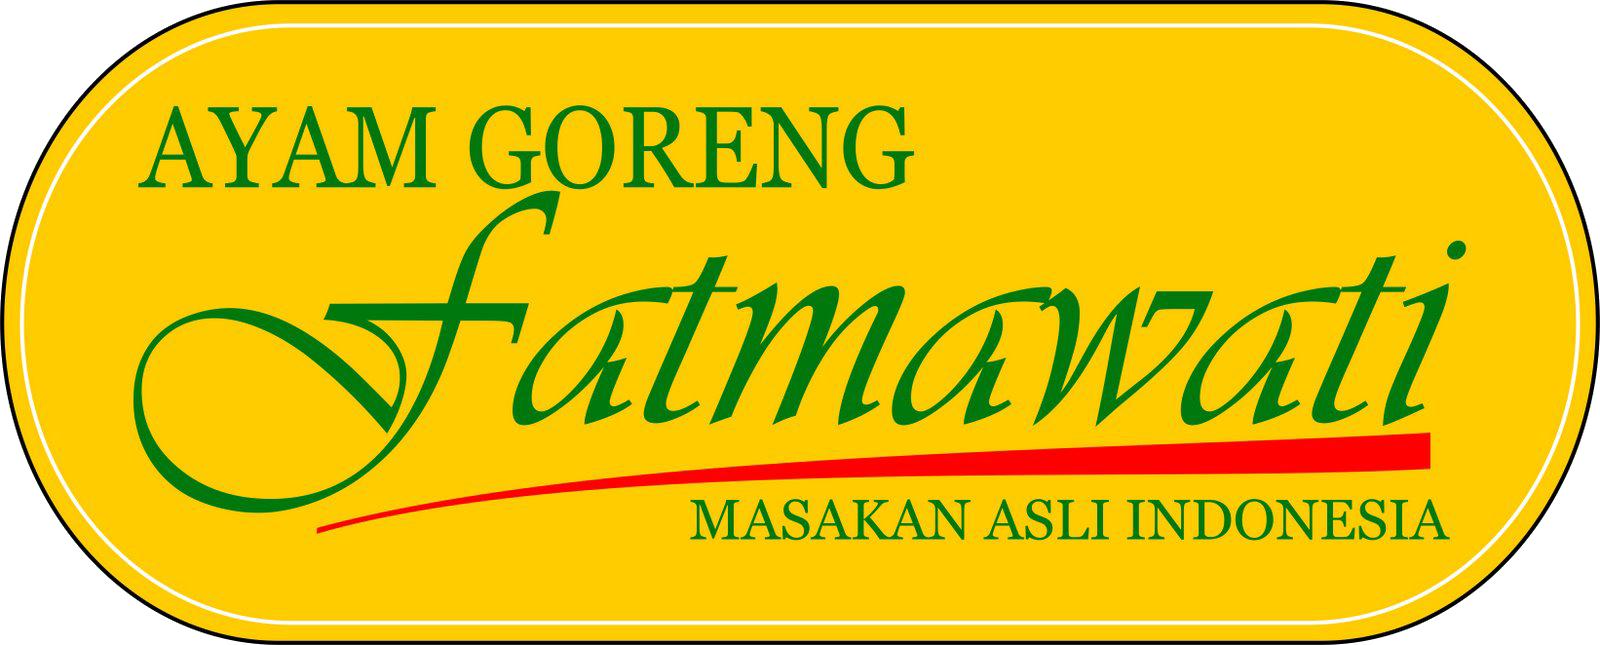 Berkas Ayam Goreng Fatmawati Png Wikipedia Bahasa